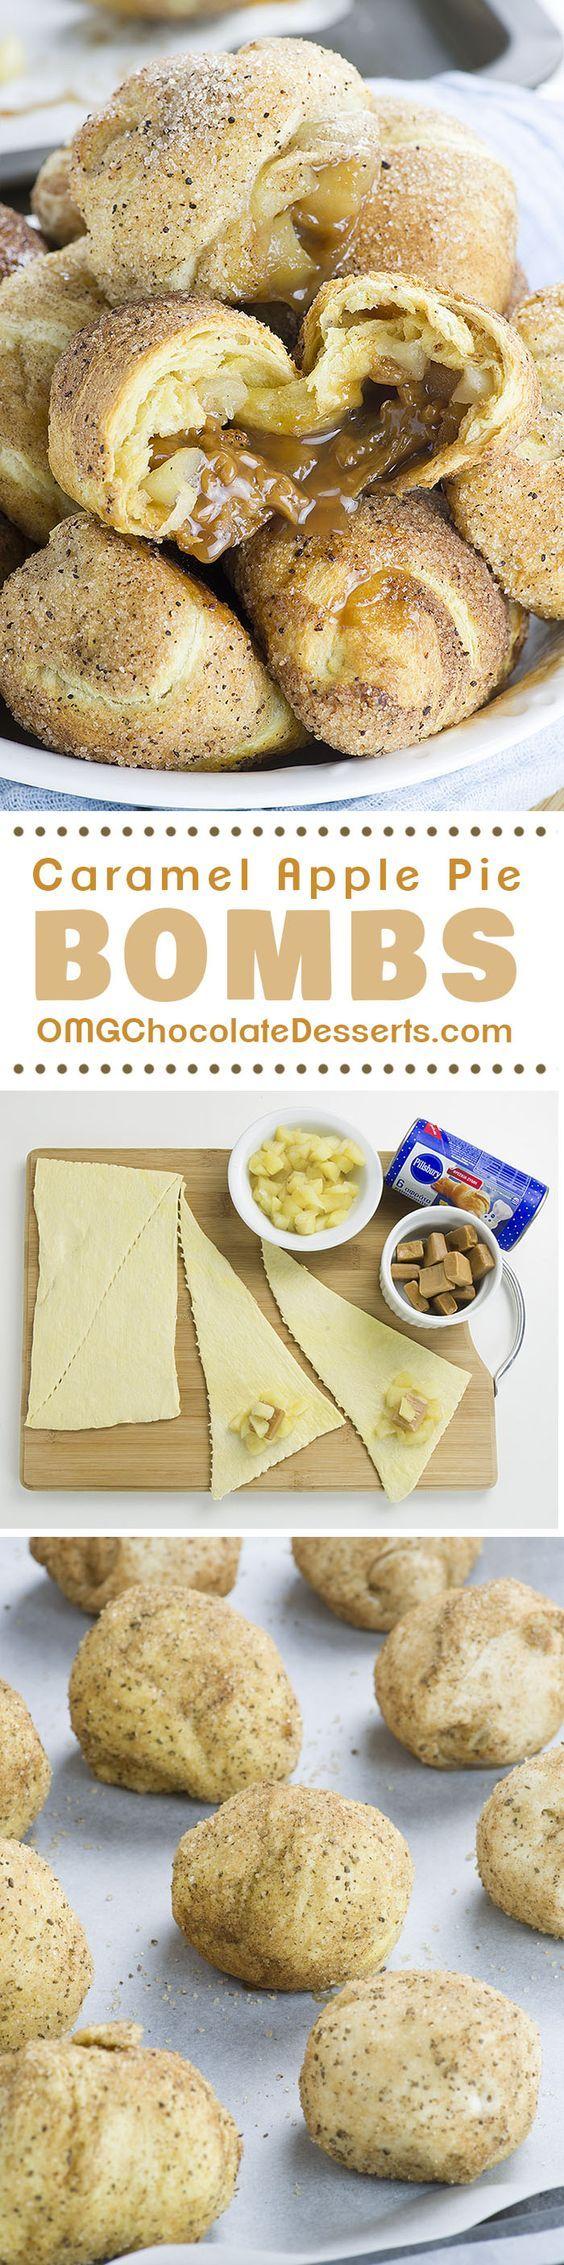 Caramel Apple Pie Bombs